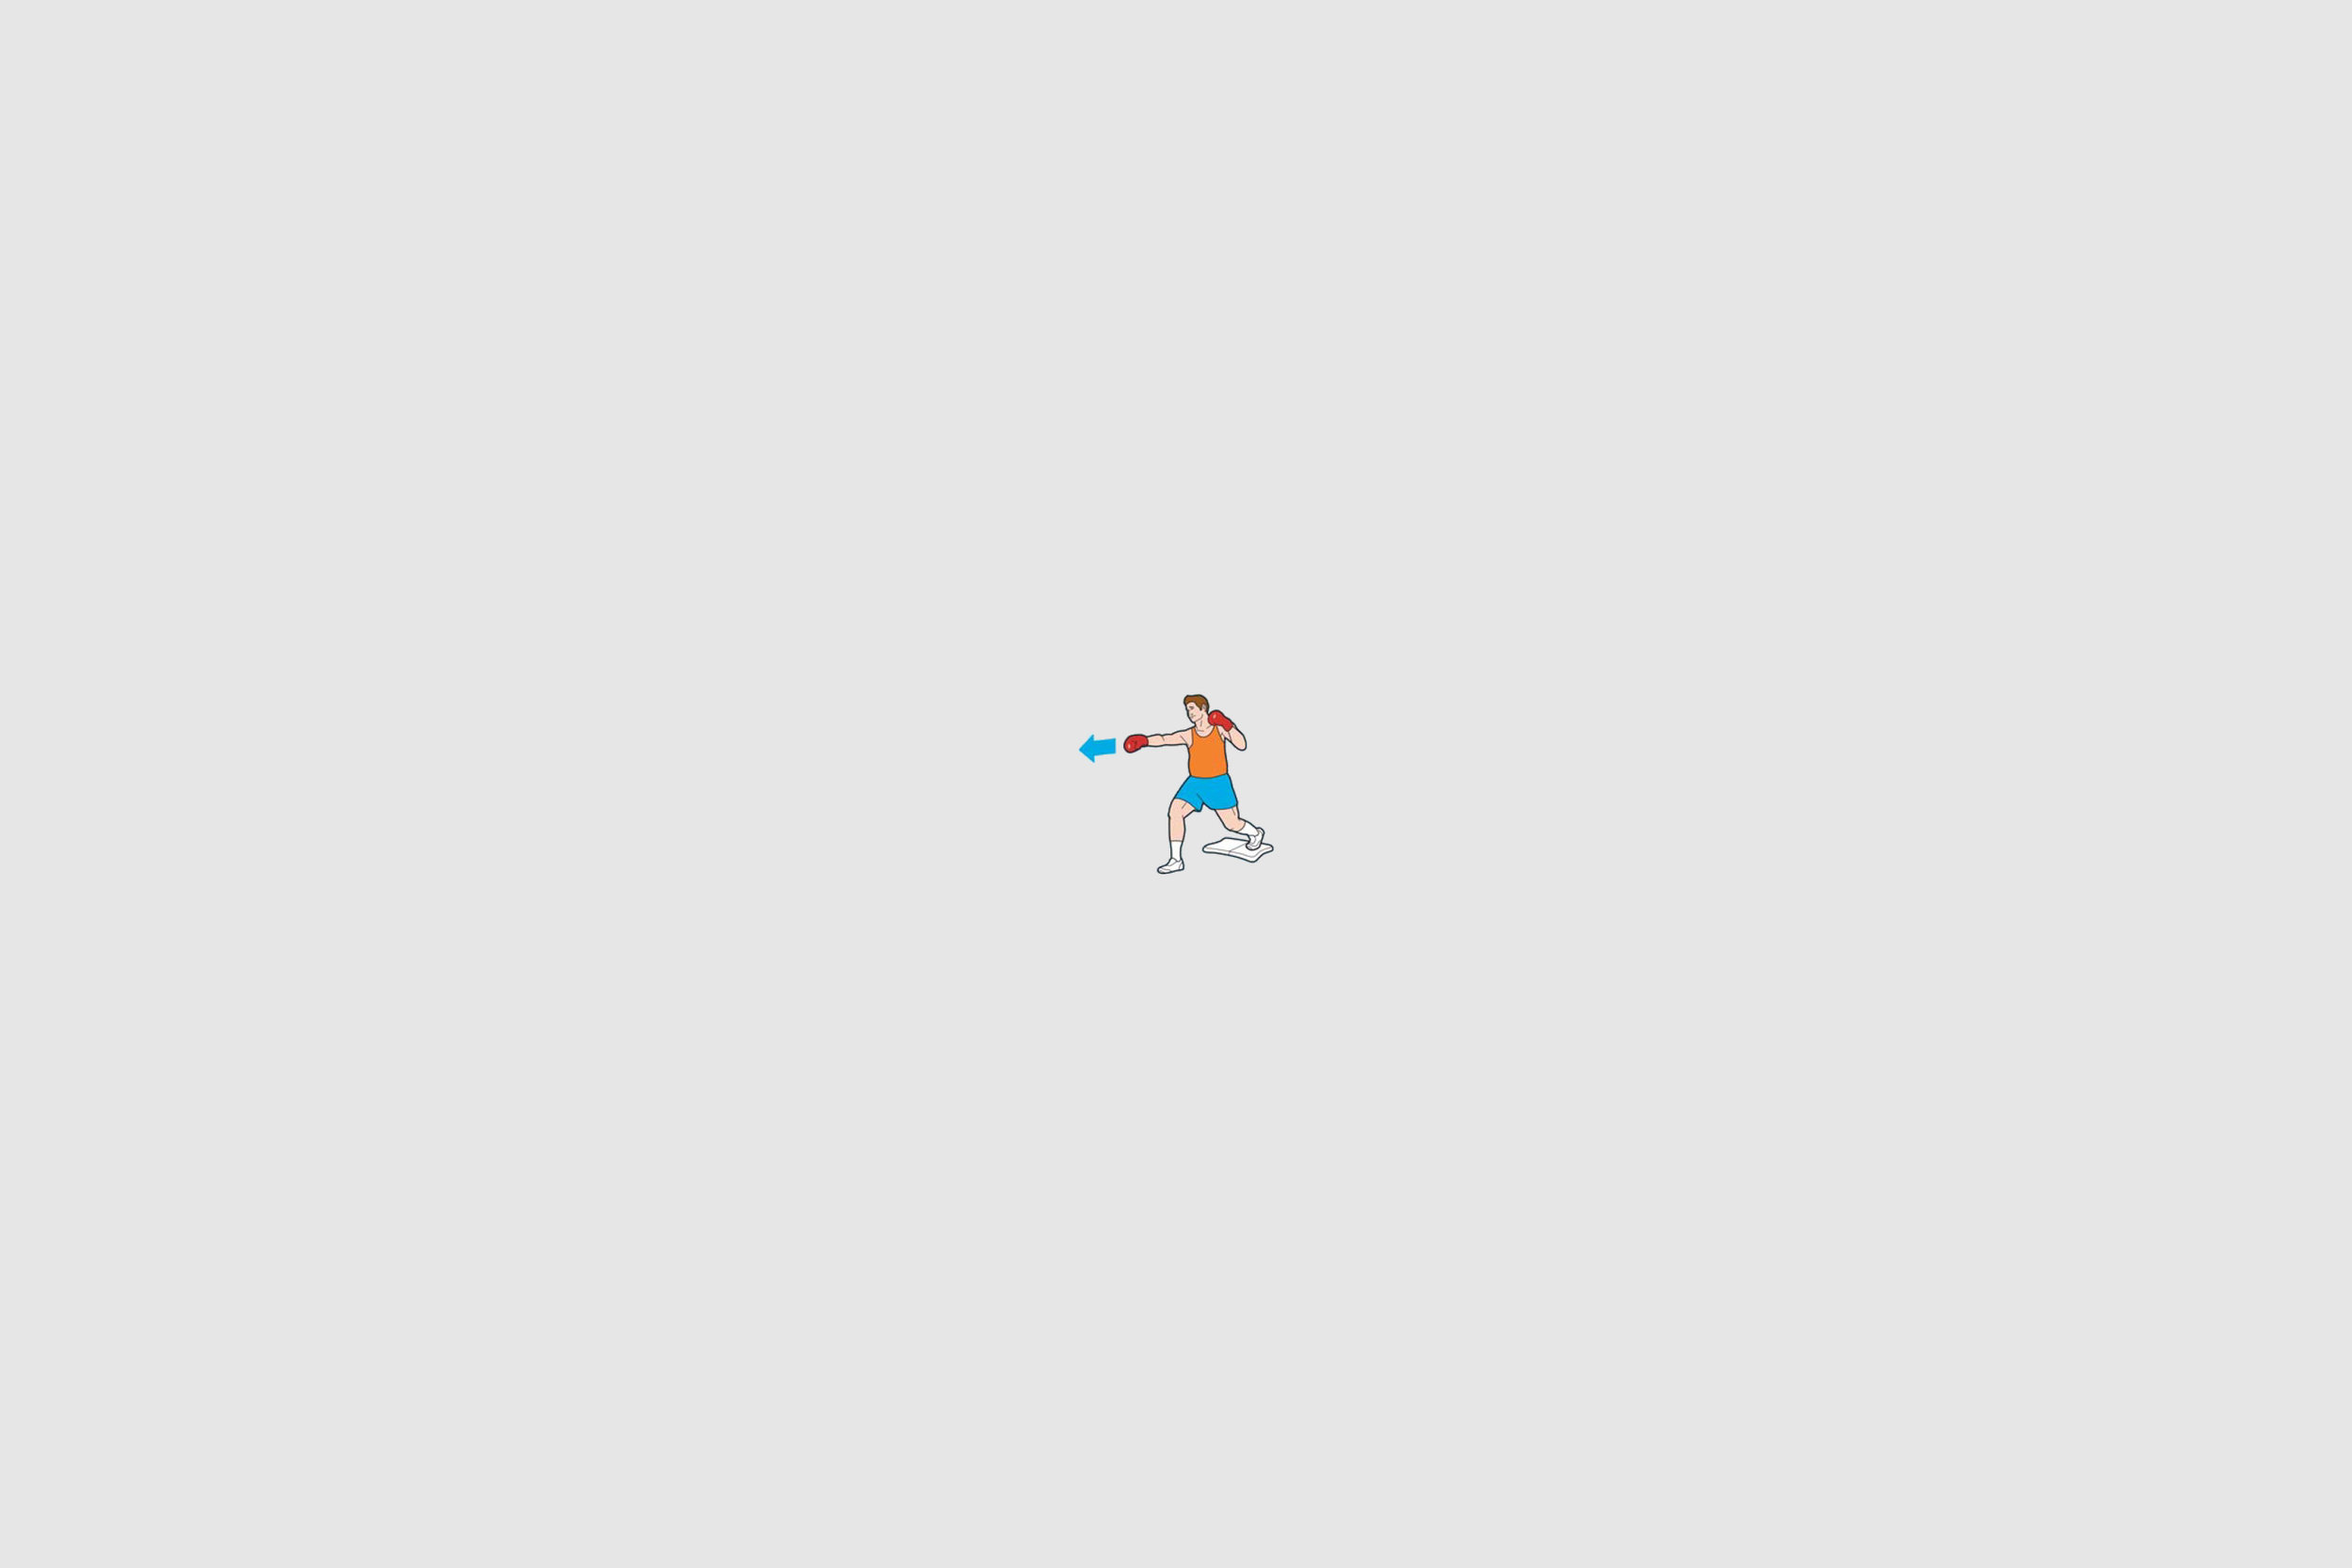 ronaldvillegas-illustration-americanway-mevswii-boxing.jpg